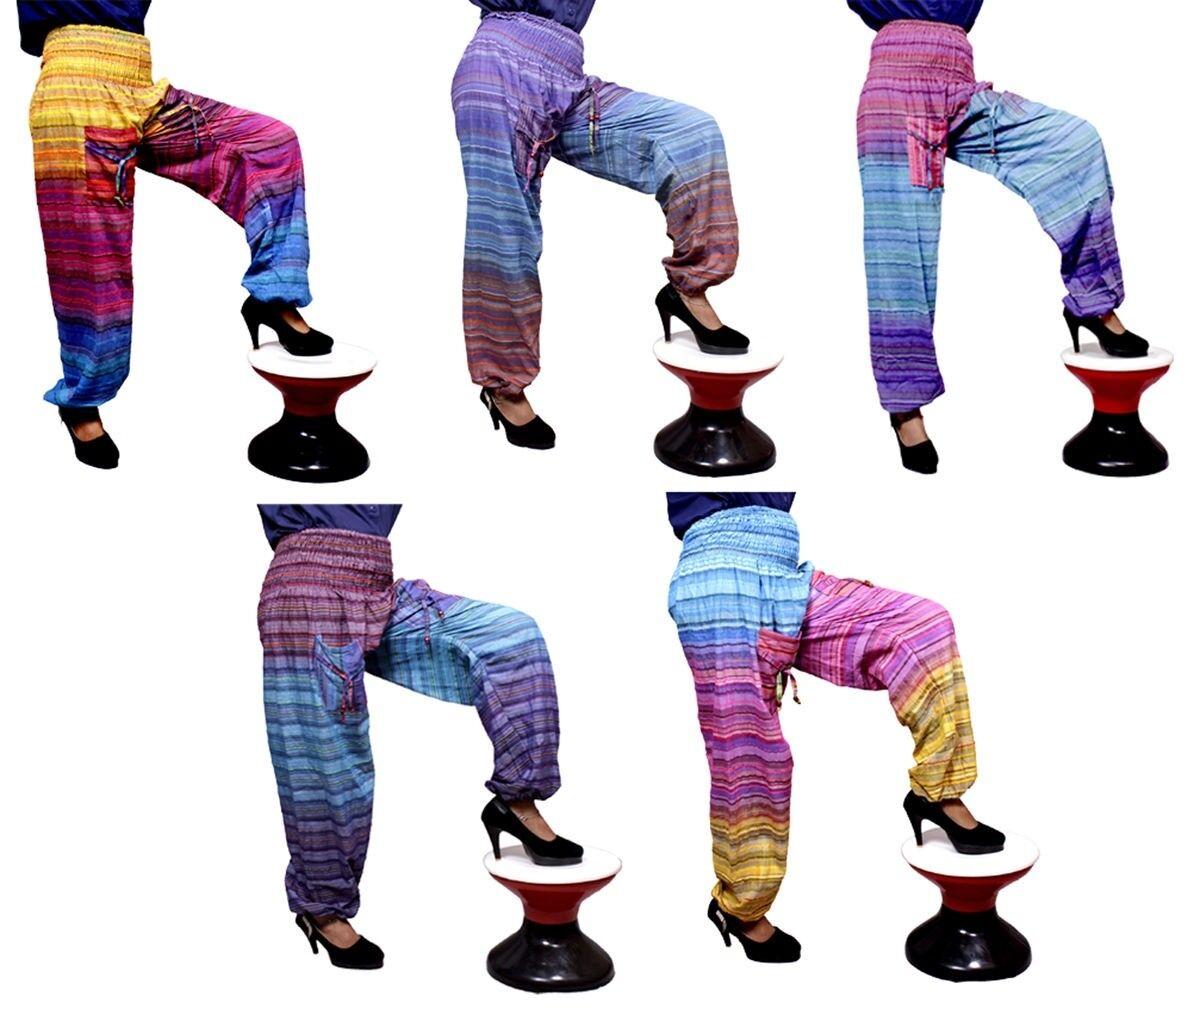 10Pcs Cotton Boho Hippie Striped Beautiful Gypsy Woman Baggy Pants Wholesale Lot